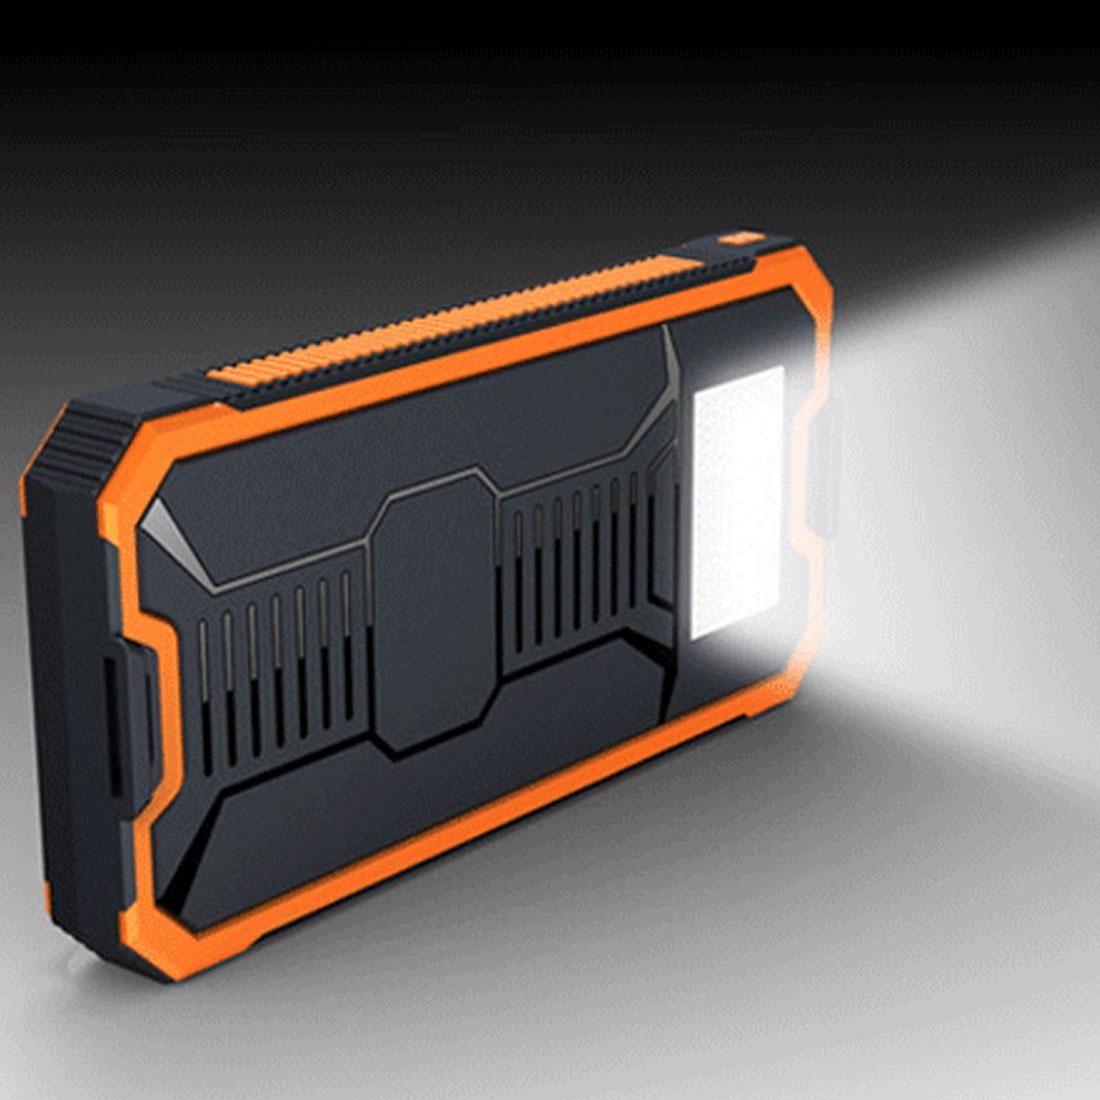 Solar Power Bank Real 20000 mAh Dual USB External Waterproof Polymer Battery Charger Outdoor Light Mobile Powerbank стоимость